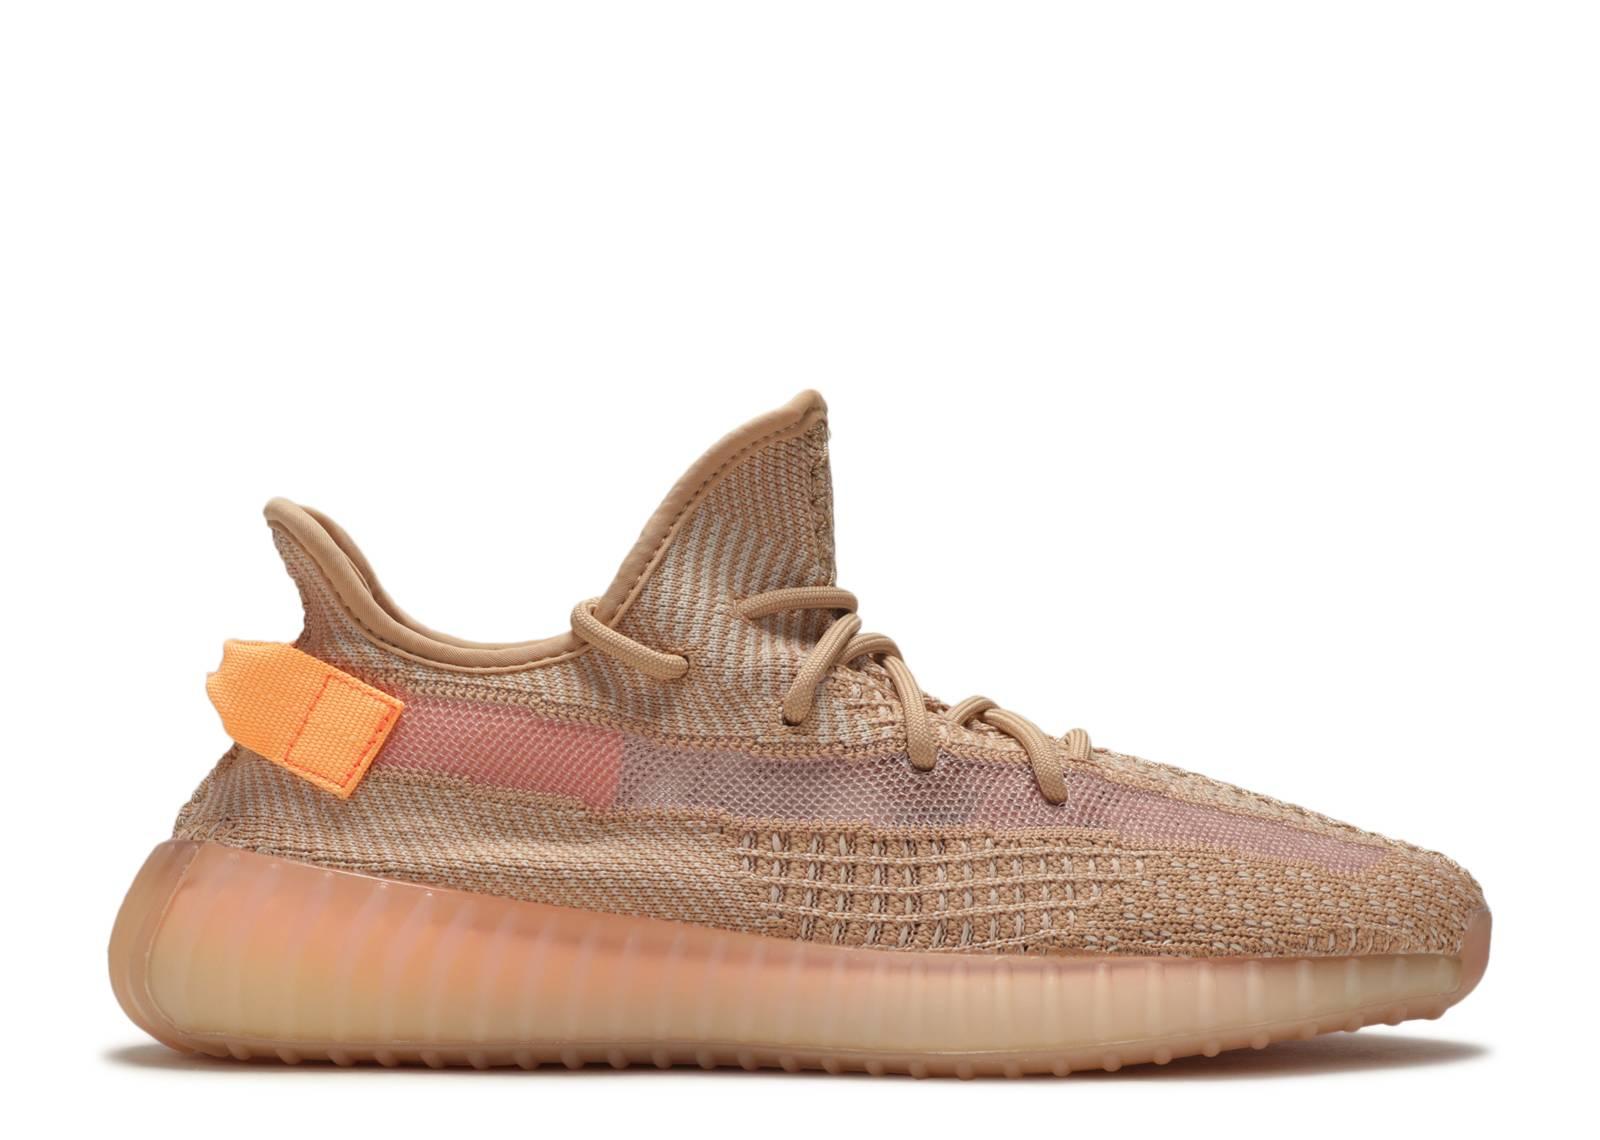 adidas Yeezy Boost 350 V2 Clay (Kids)